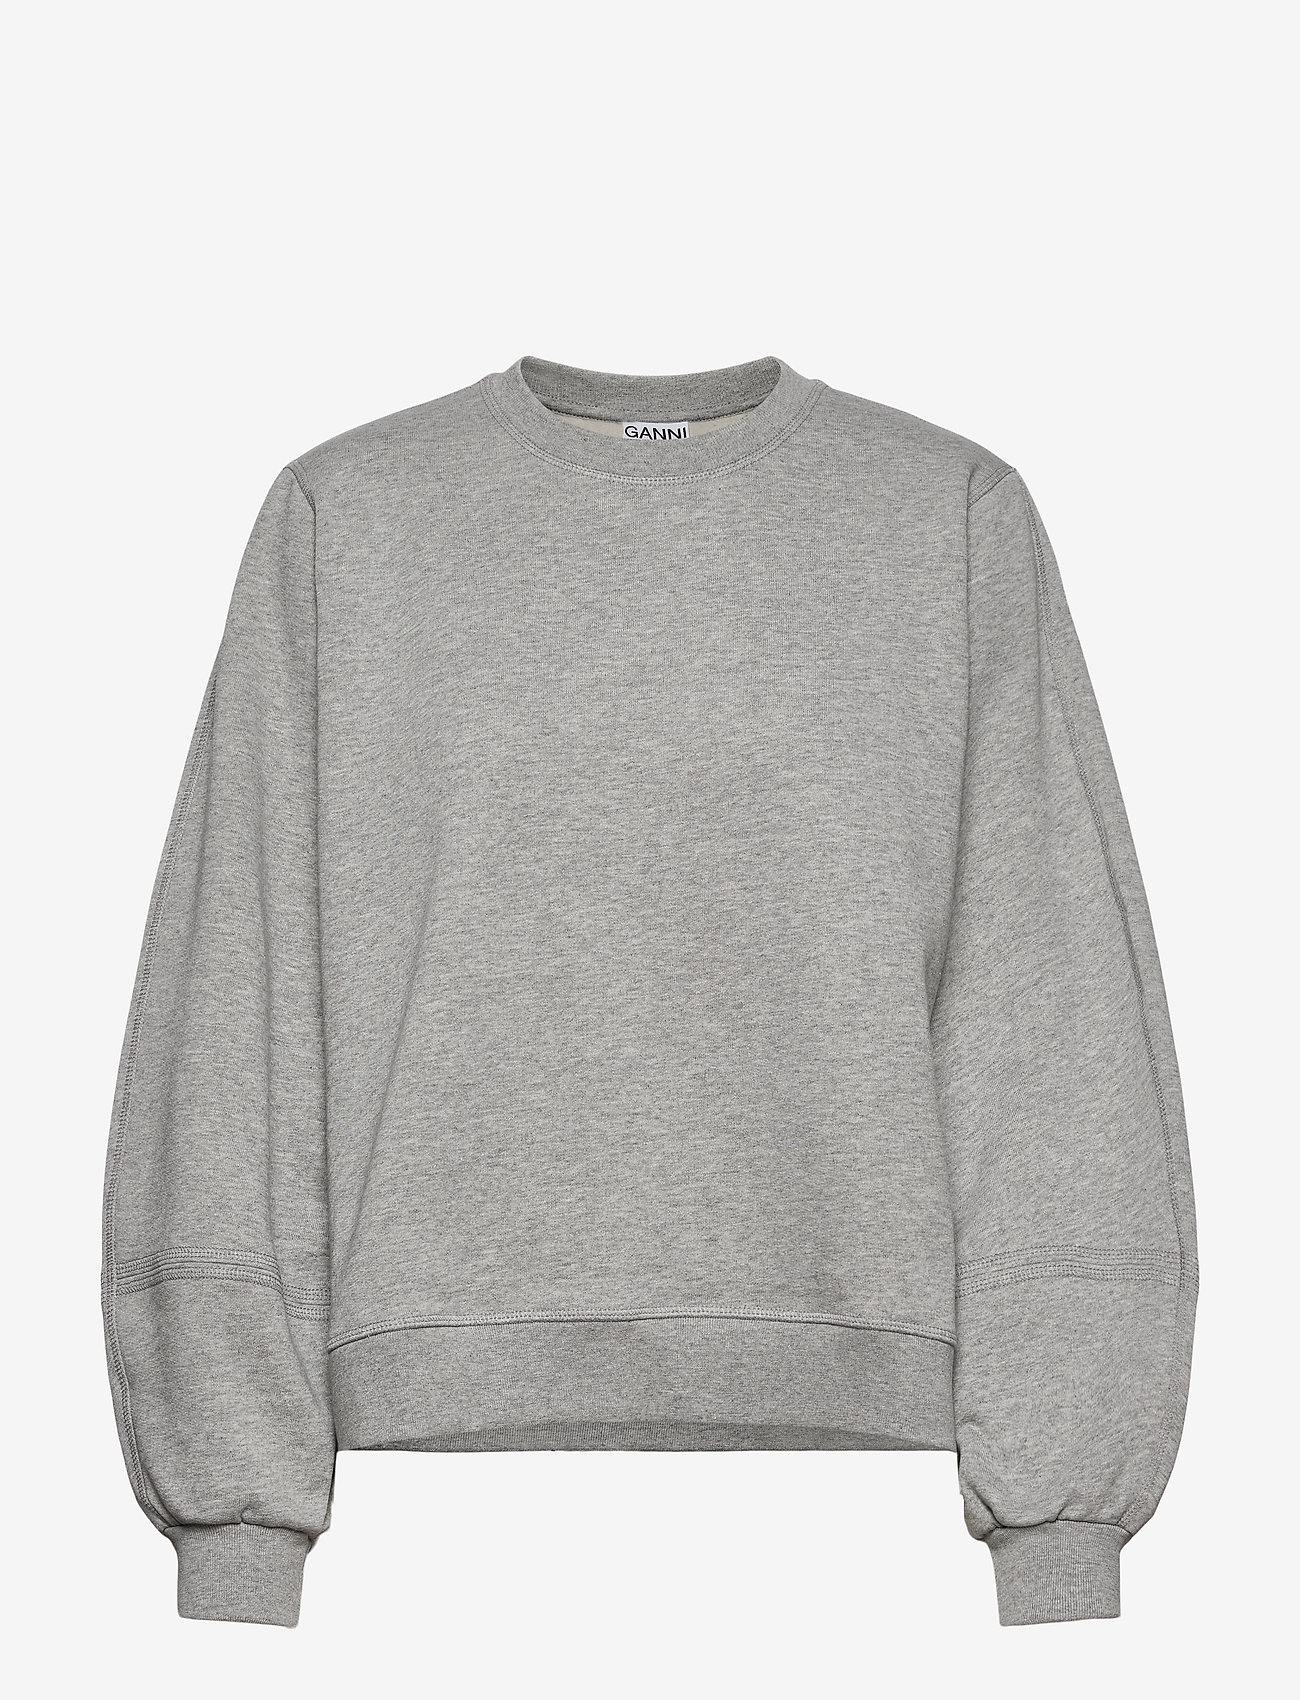 Ganni - Software Isoli - sweatshirts & hoodies - paloma melange - 0